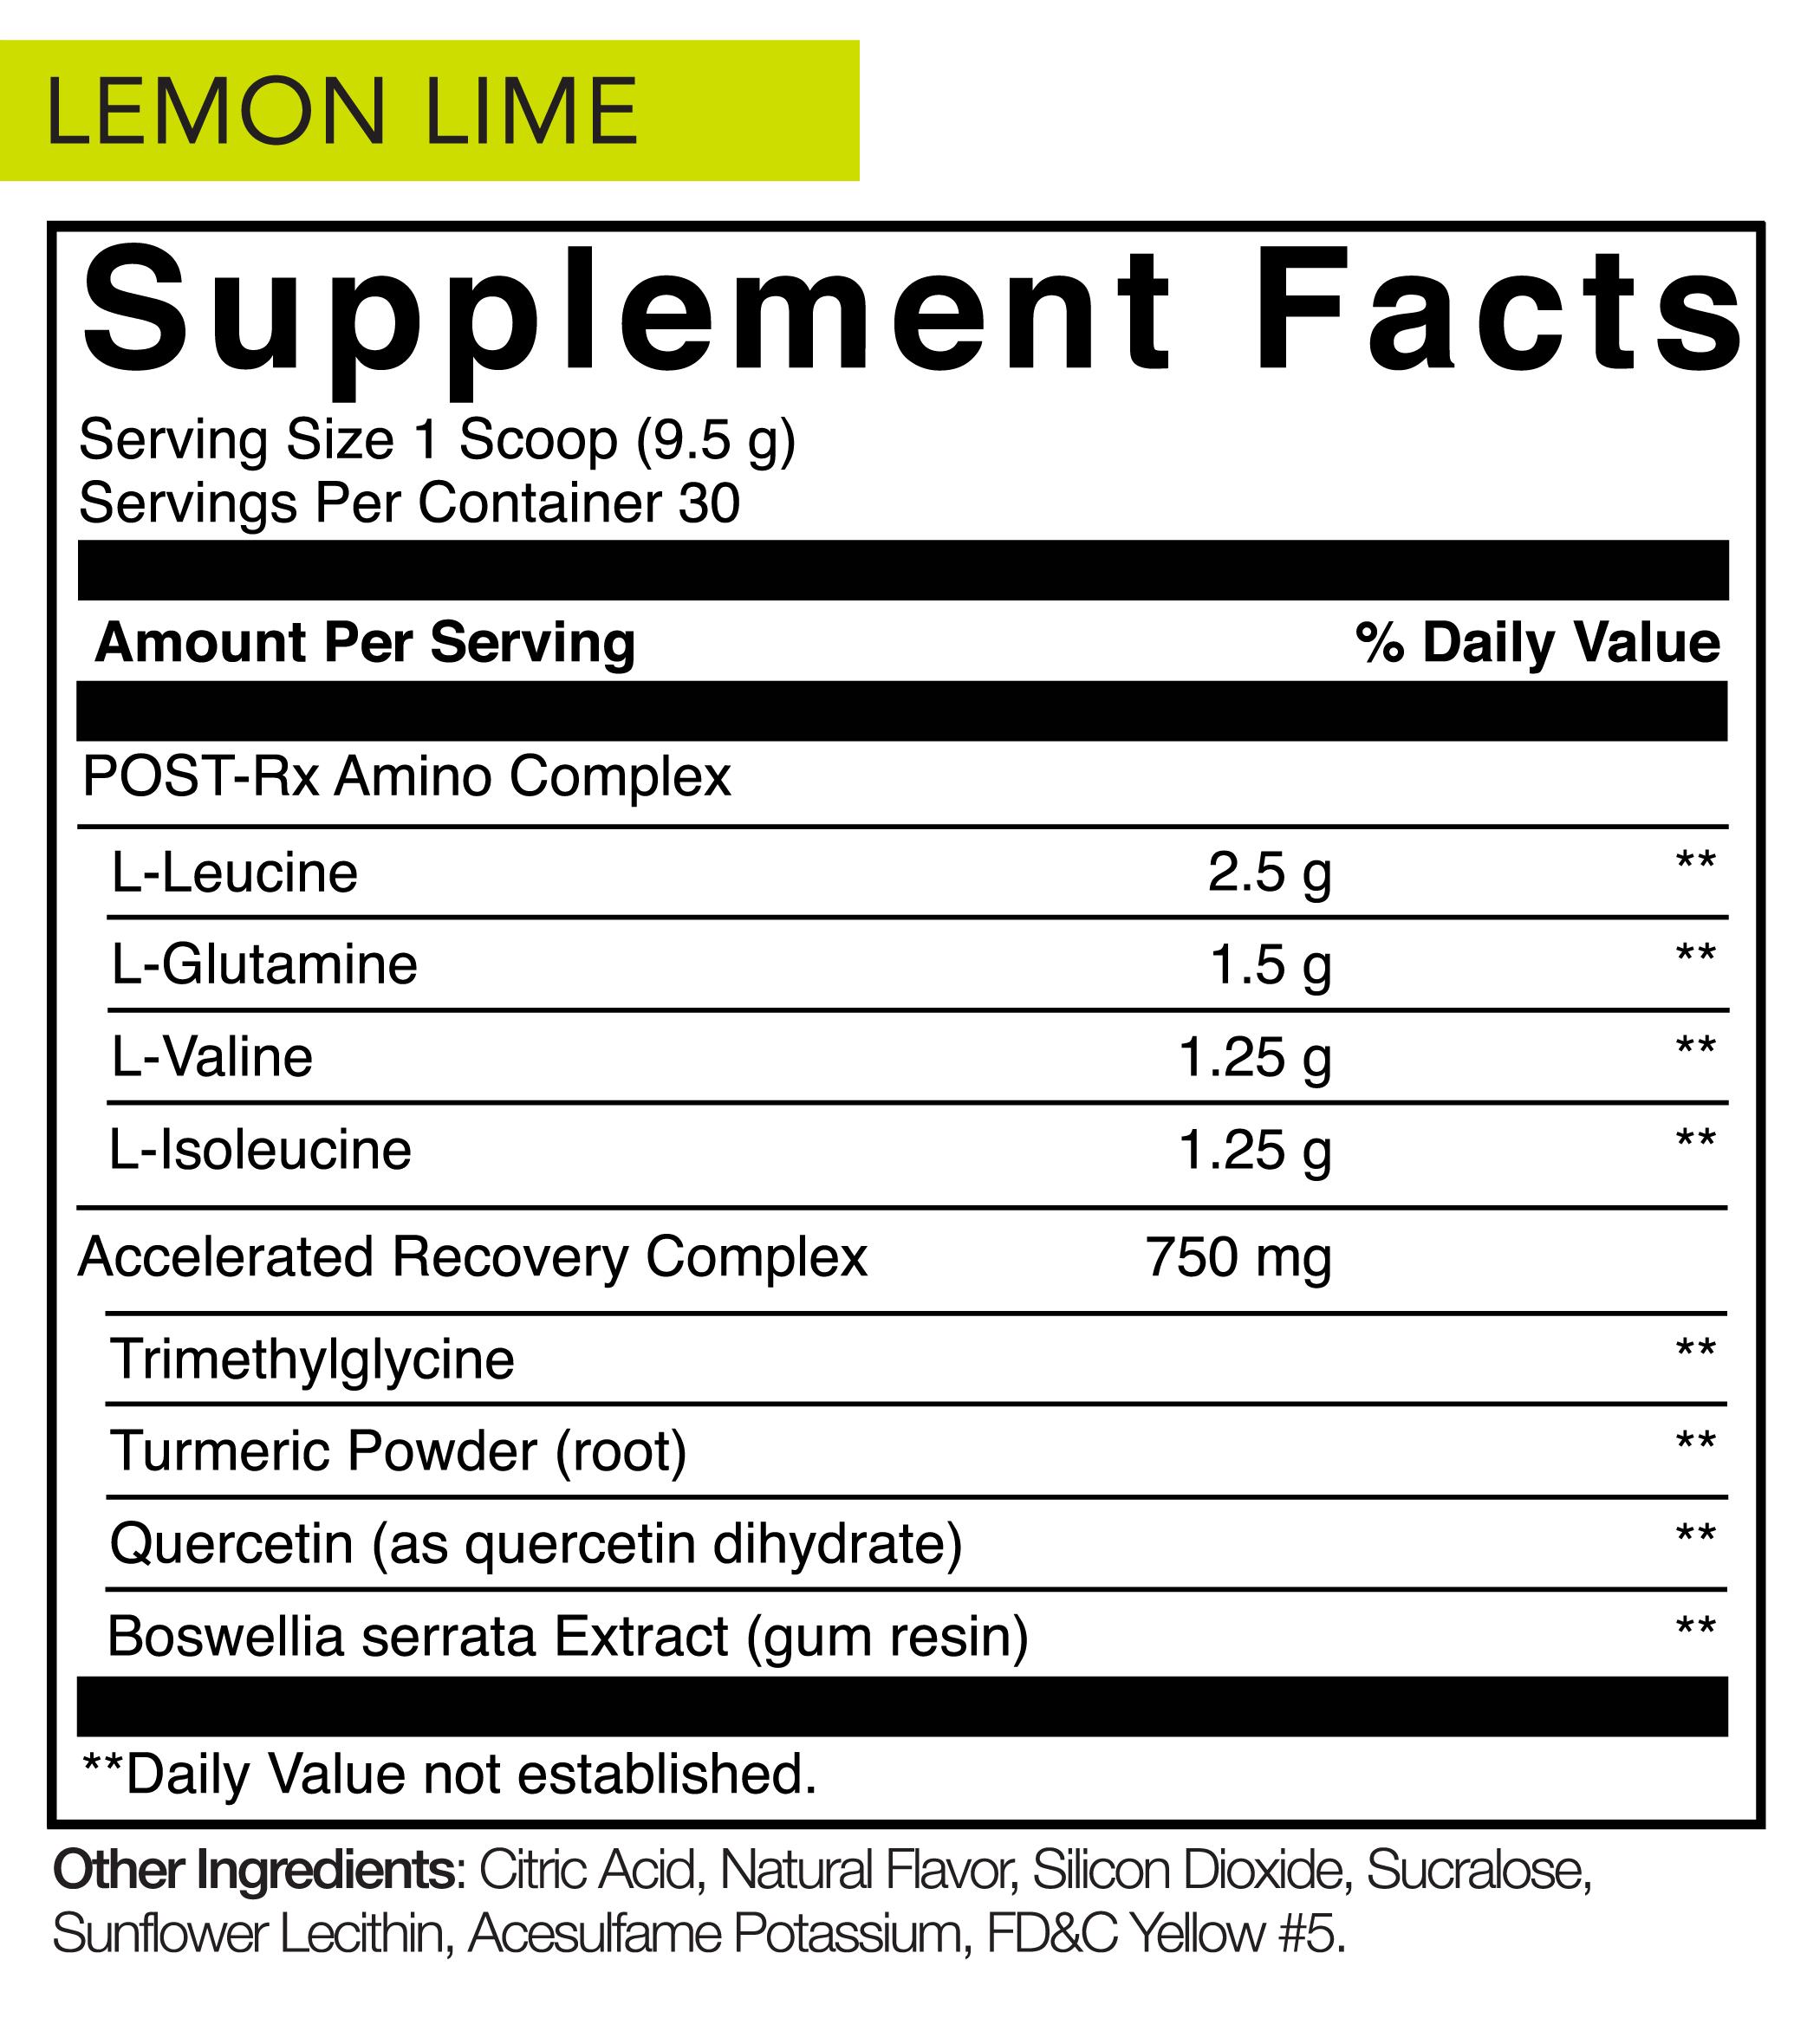 Lemon Lime Nutrition